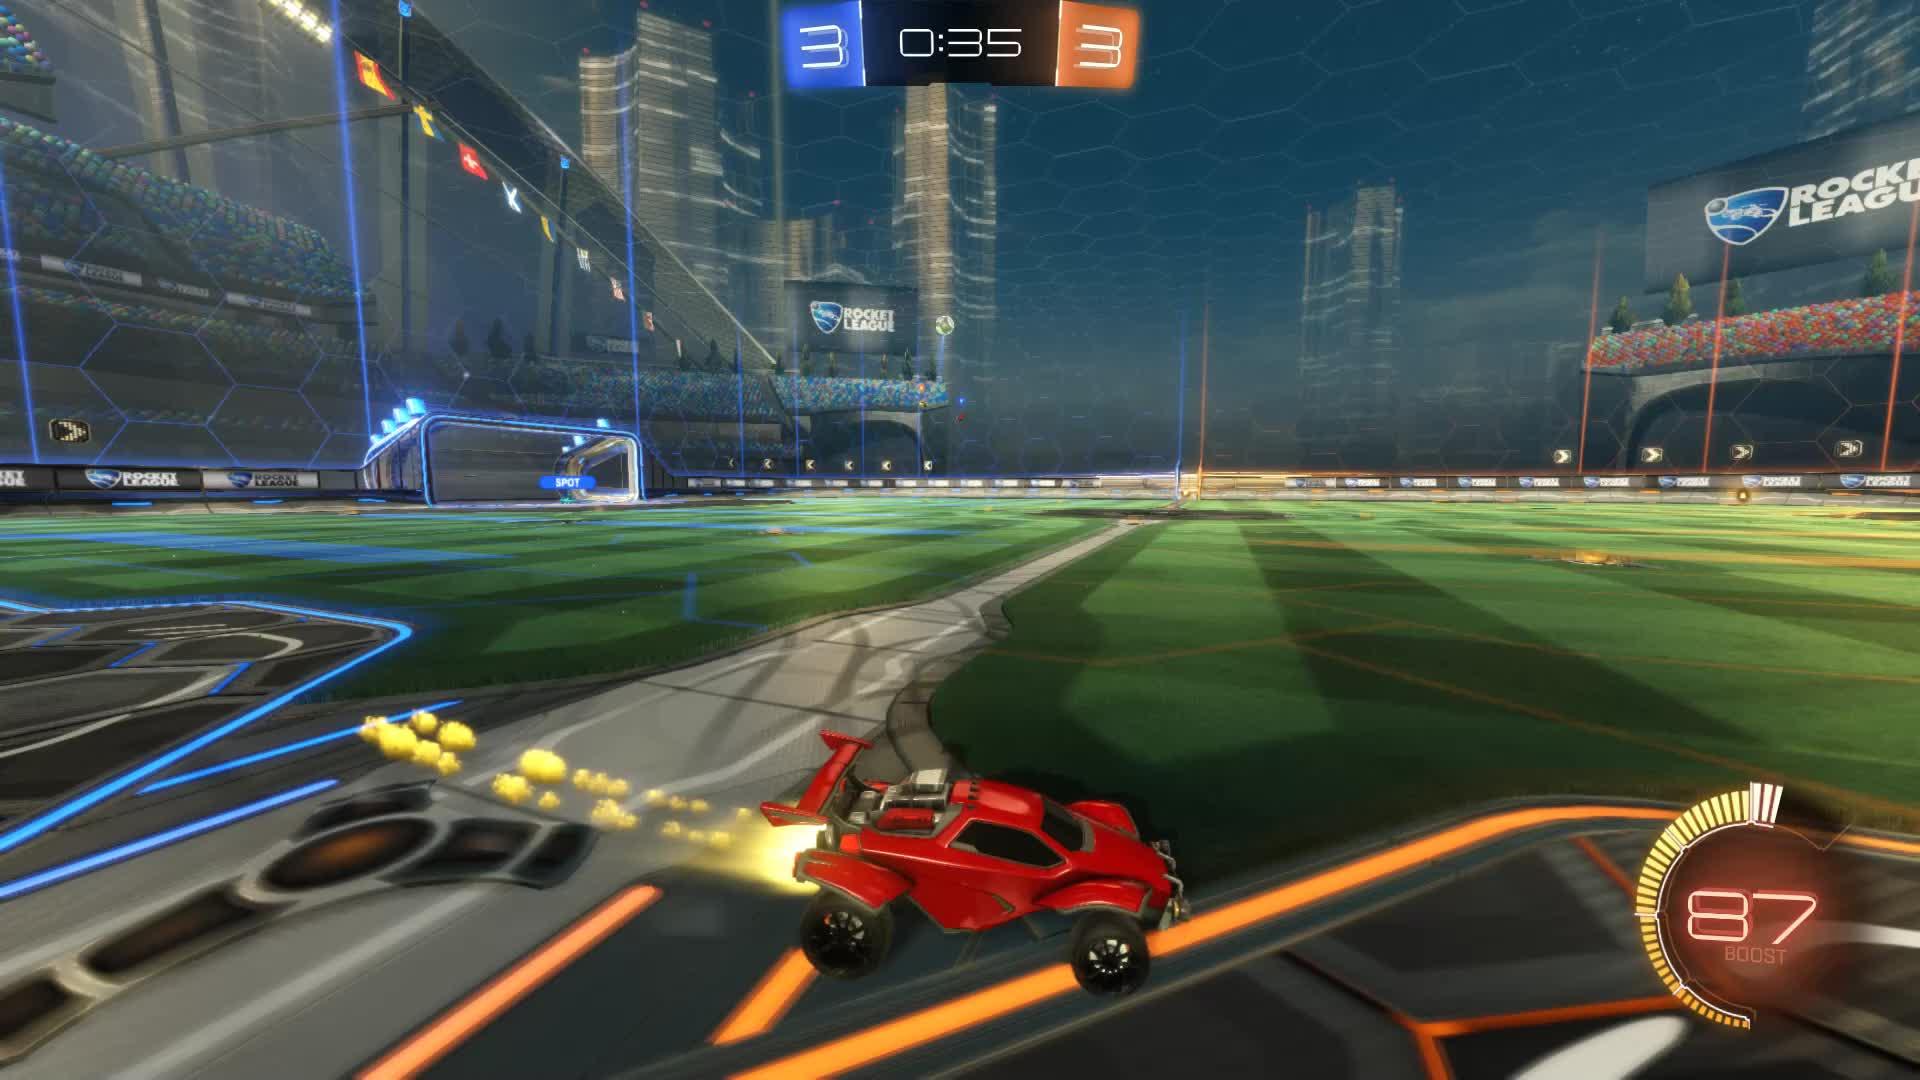 Gif Your Game, GifYourGame, Goal, Rocket League, RocketLeague, Squash, Goal 7: Squash GIFs